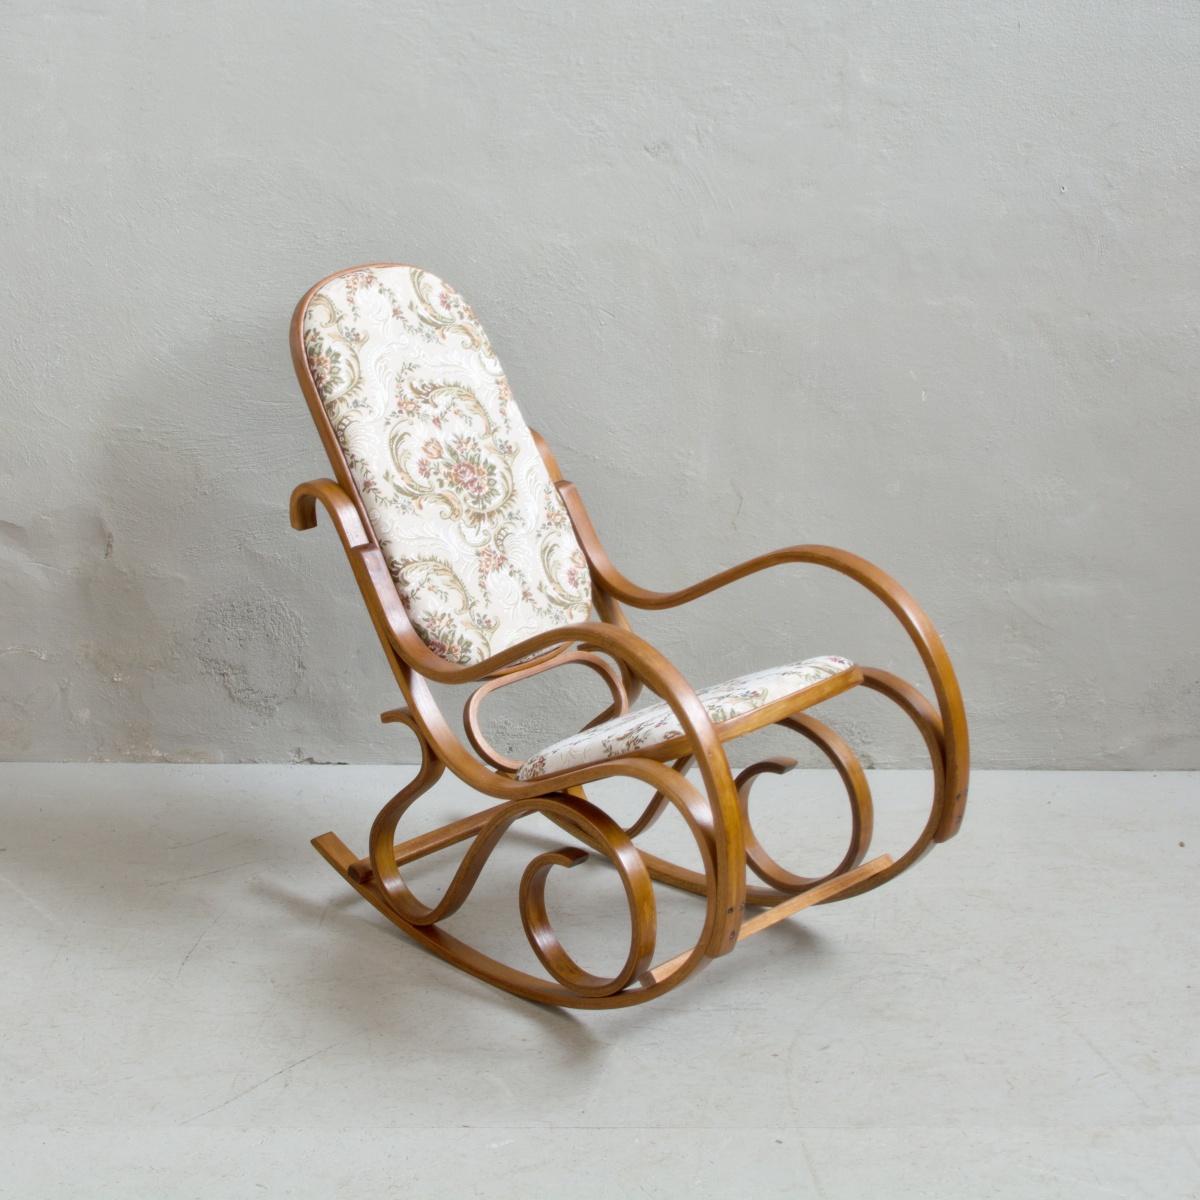 Prodej retro nábytku retro houpací křeslo